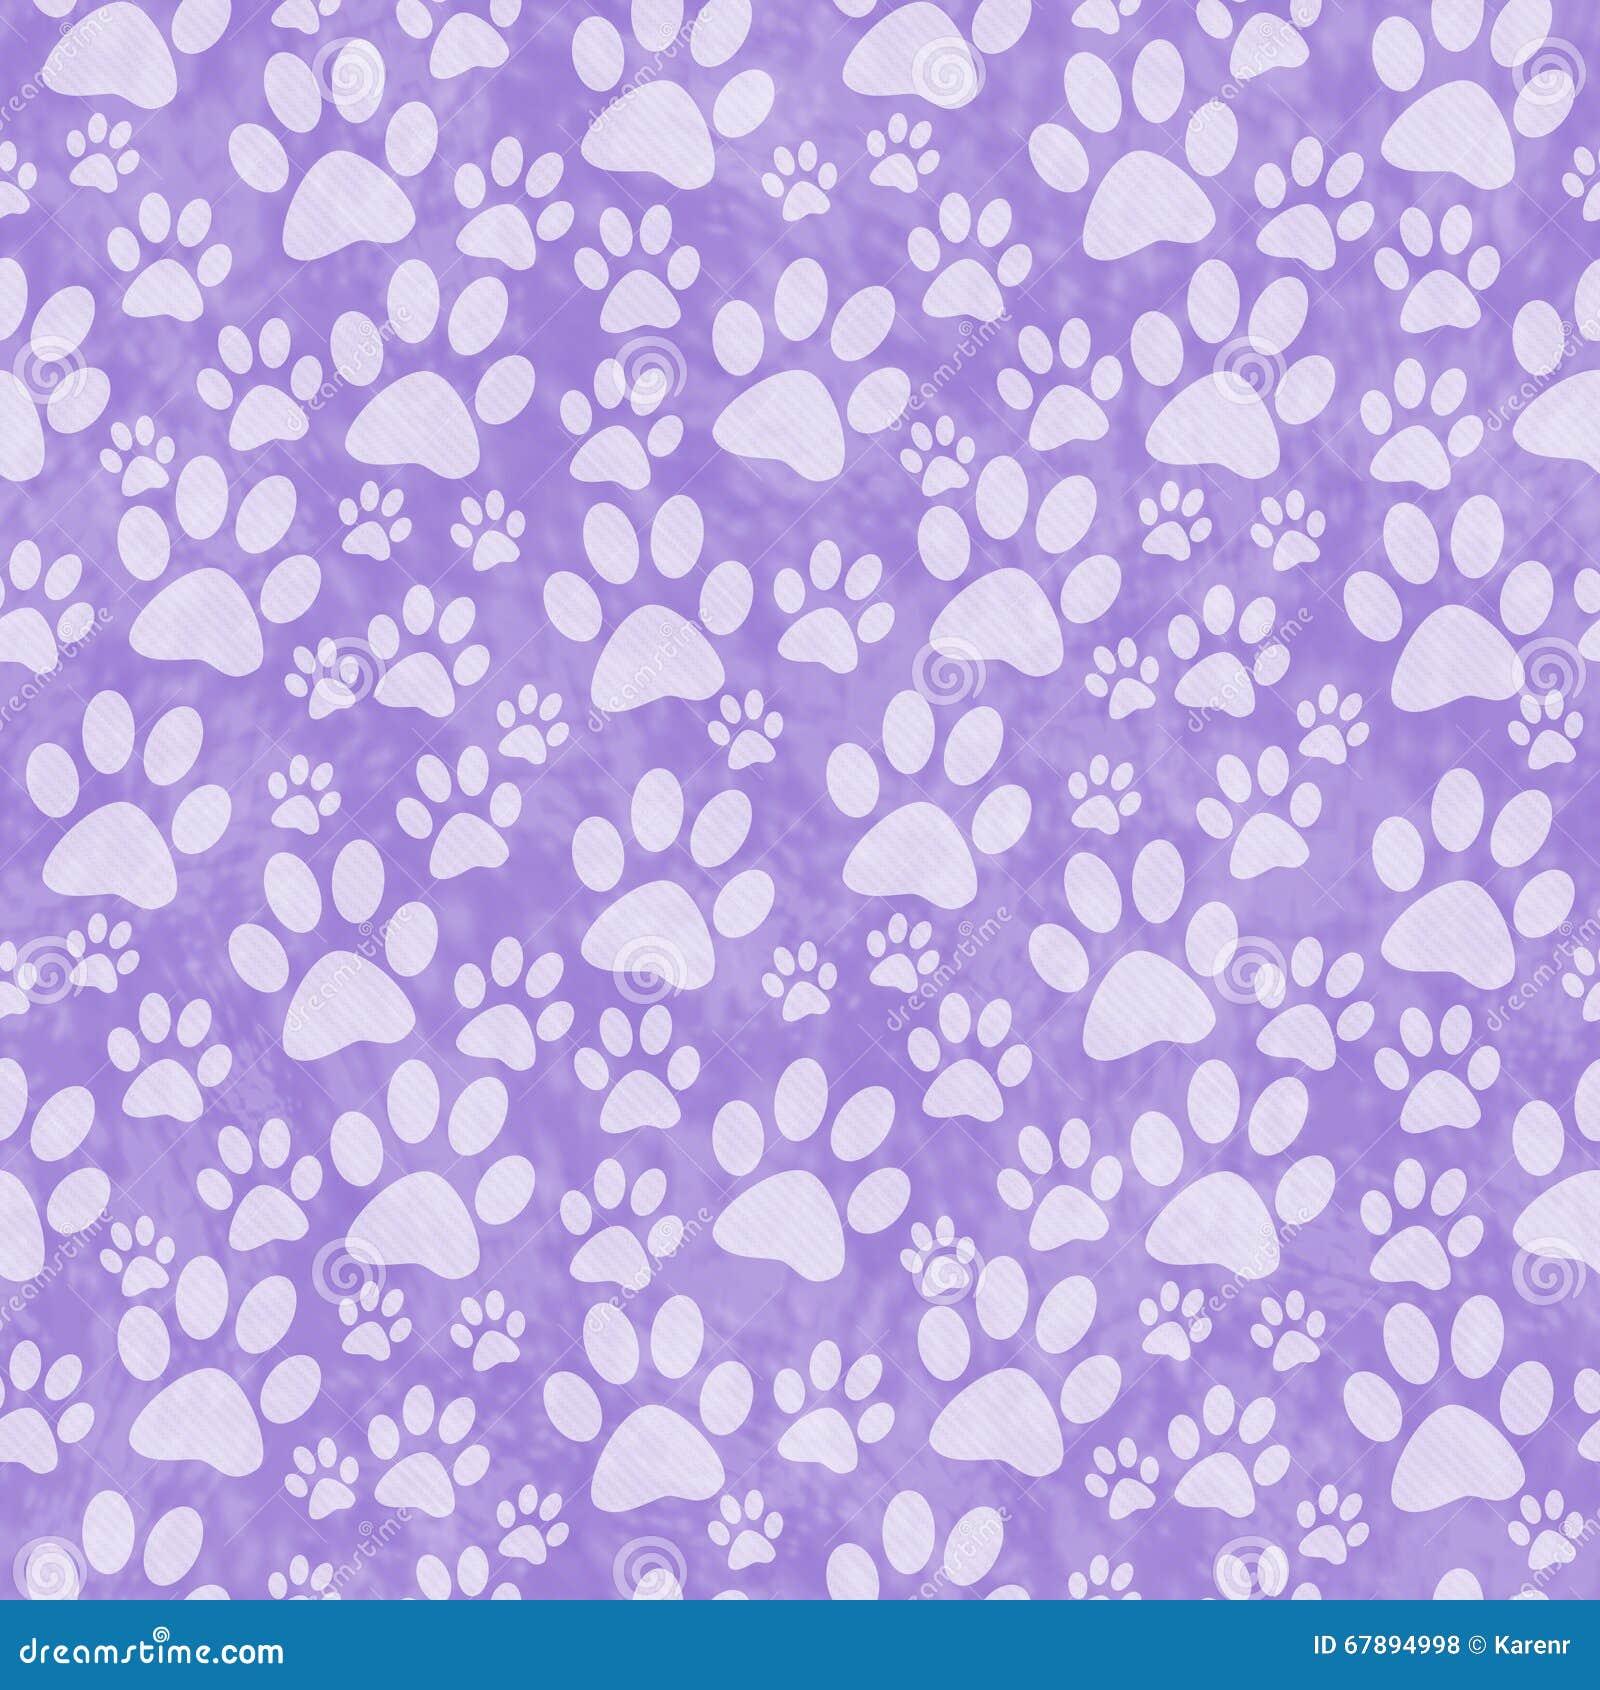 Fundo canino roxo de Paw Print Tile Pattern Repeat